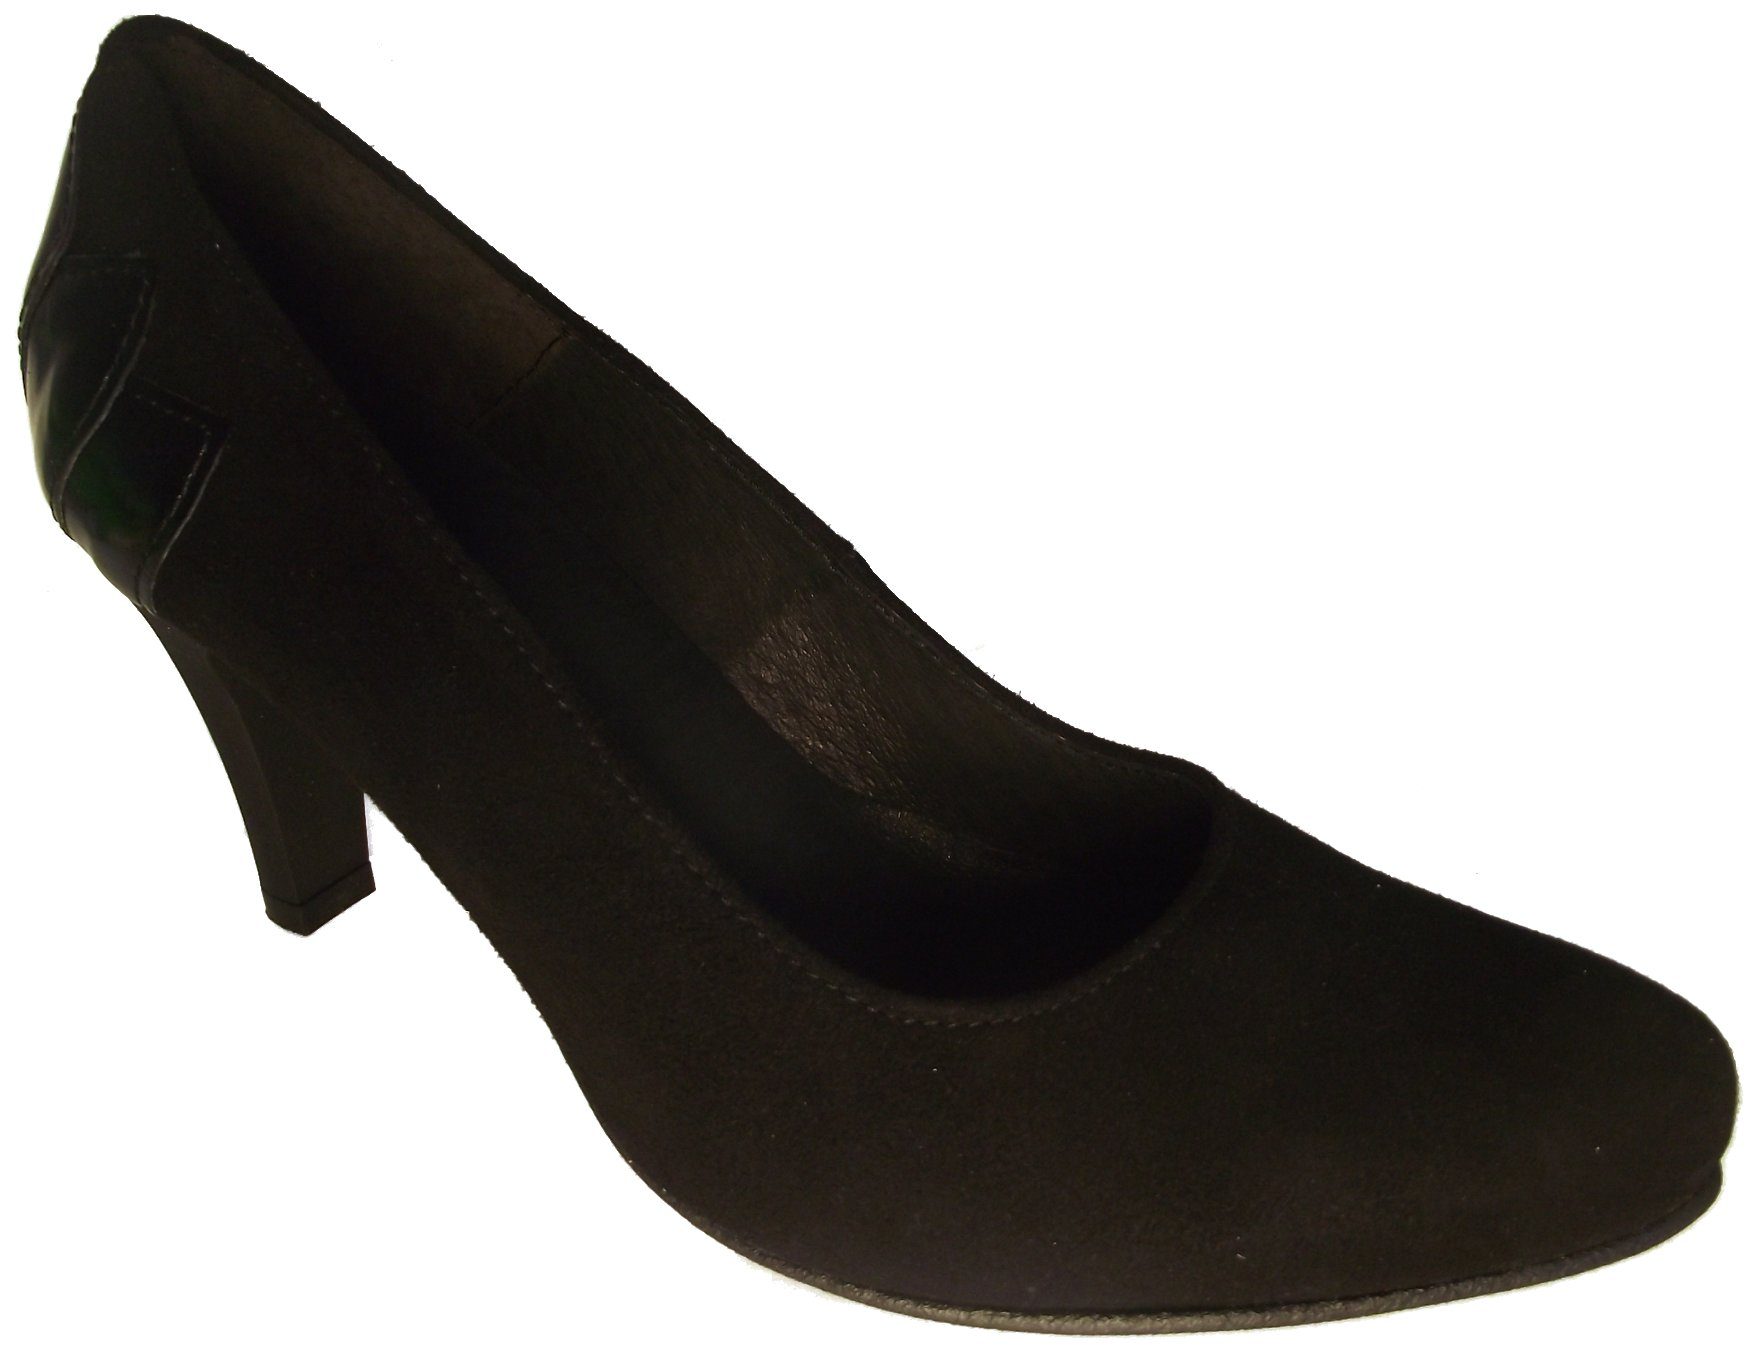 Společenská obuv BARTON 2714 Velikost: 37 (EU)